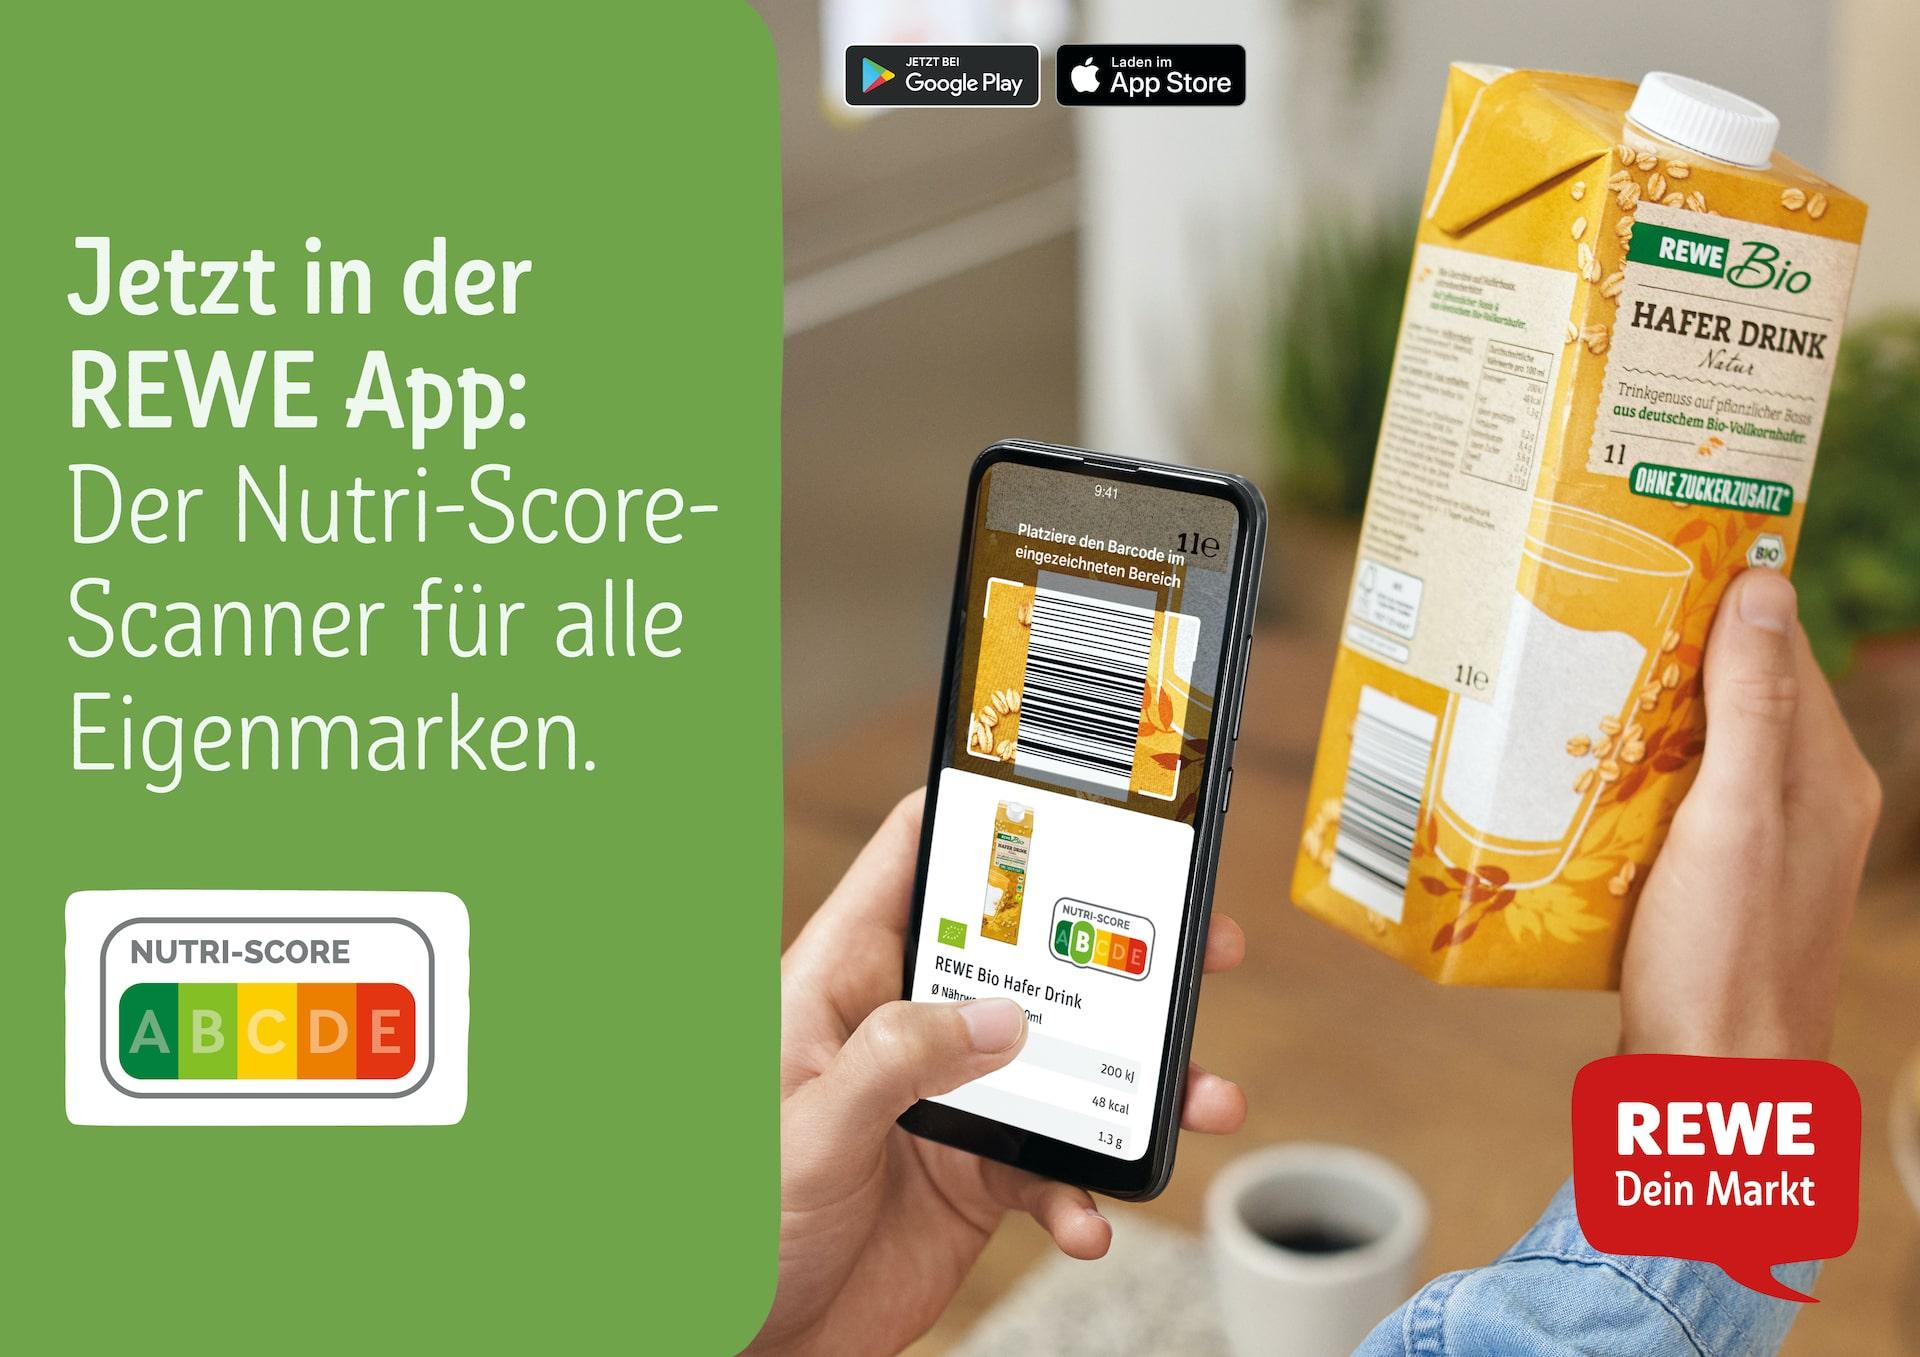 REWE_Q1_App_Max_Threlfall_Greta_Horsch